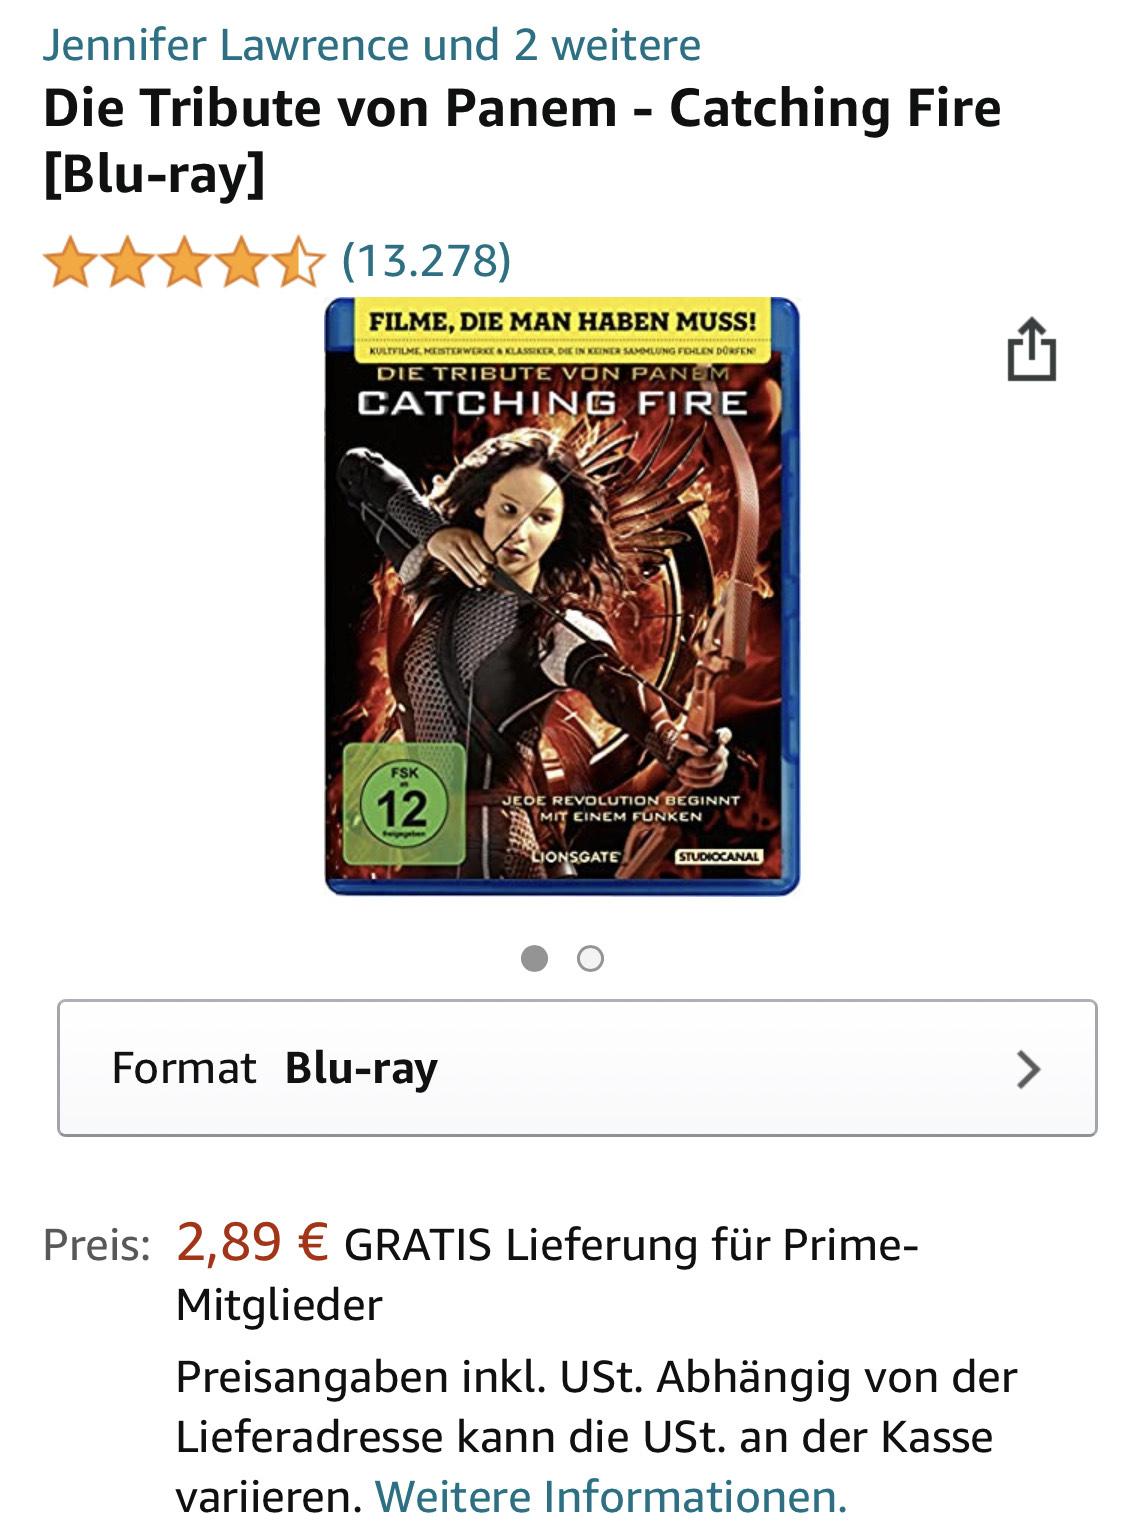 Die Tribute von Panem - Catching Fire [Blu-ray] - Amazon Prime